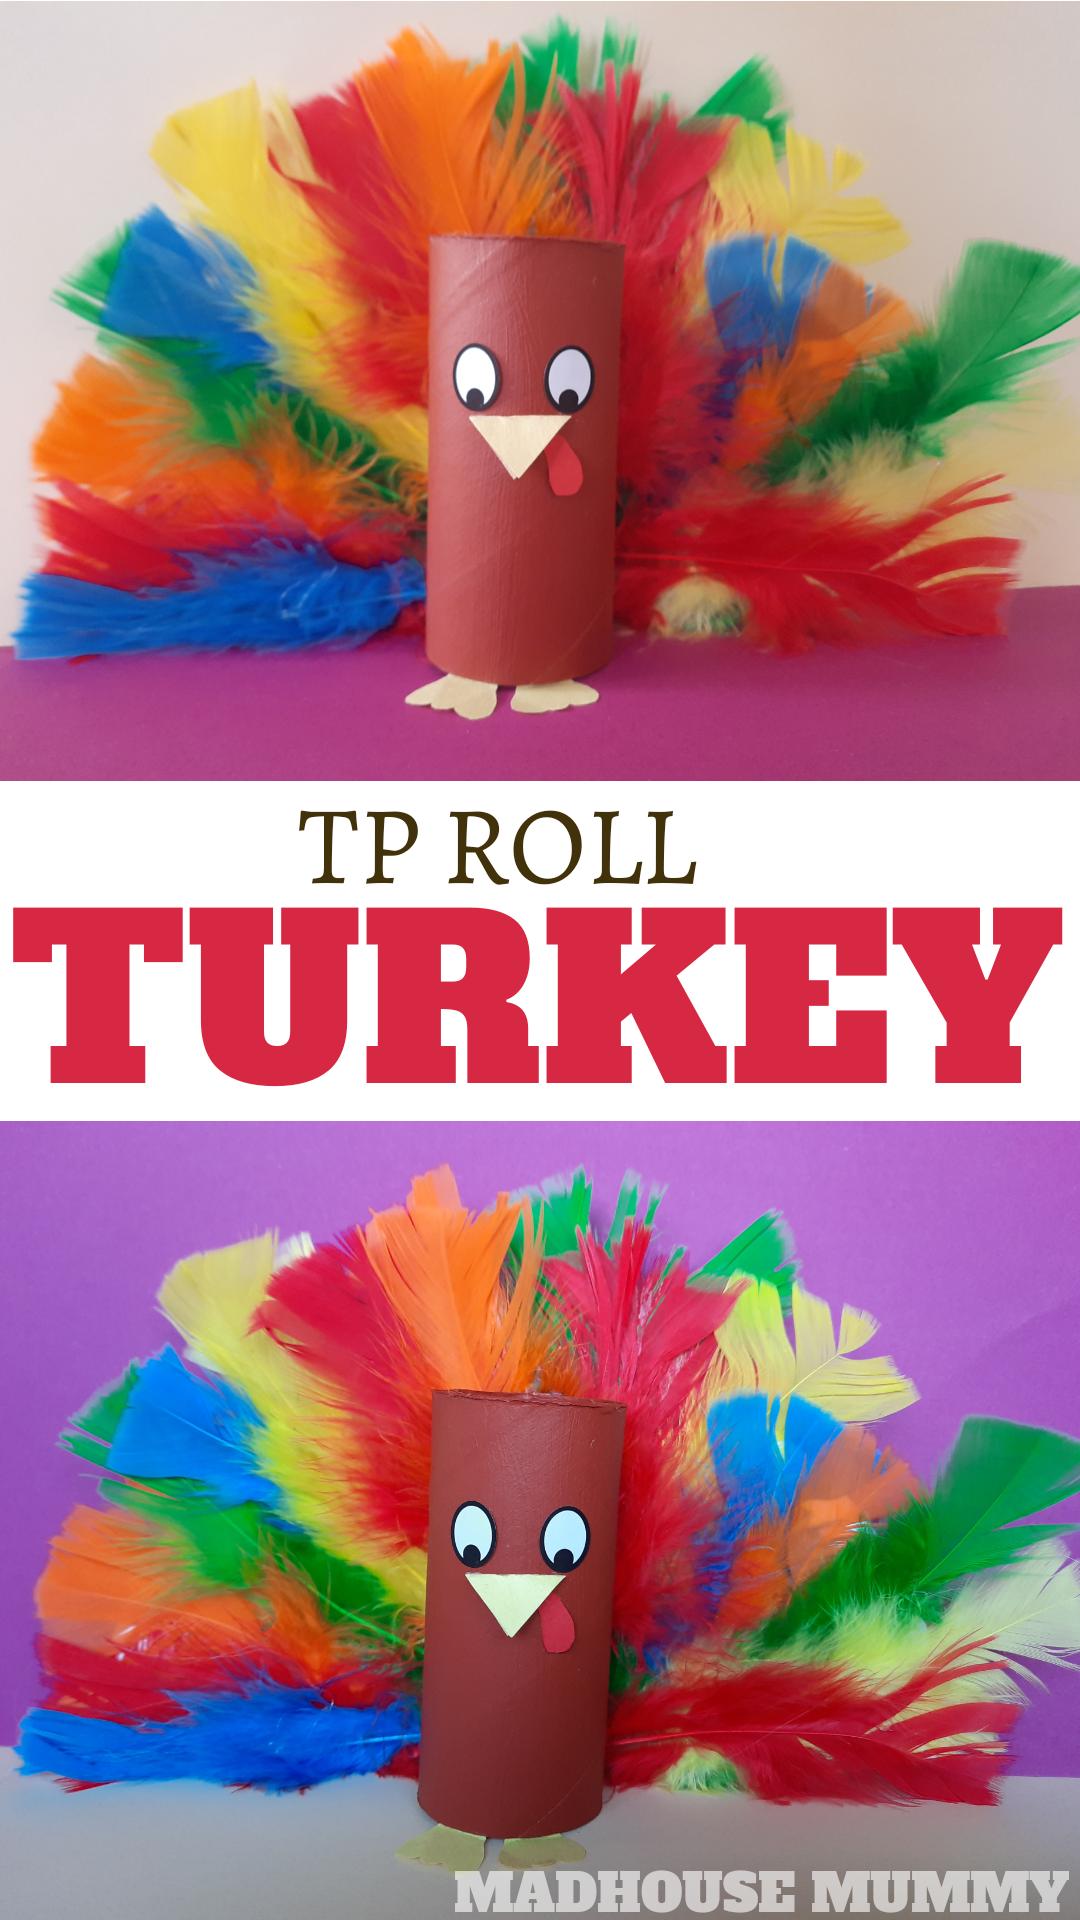 TP Roll turkey craft for kids